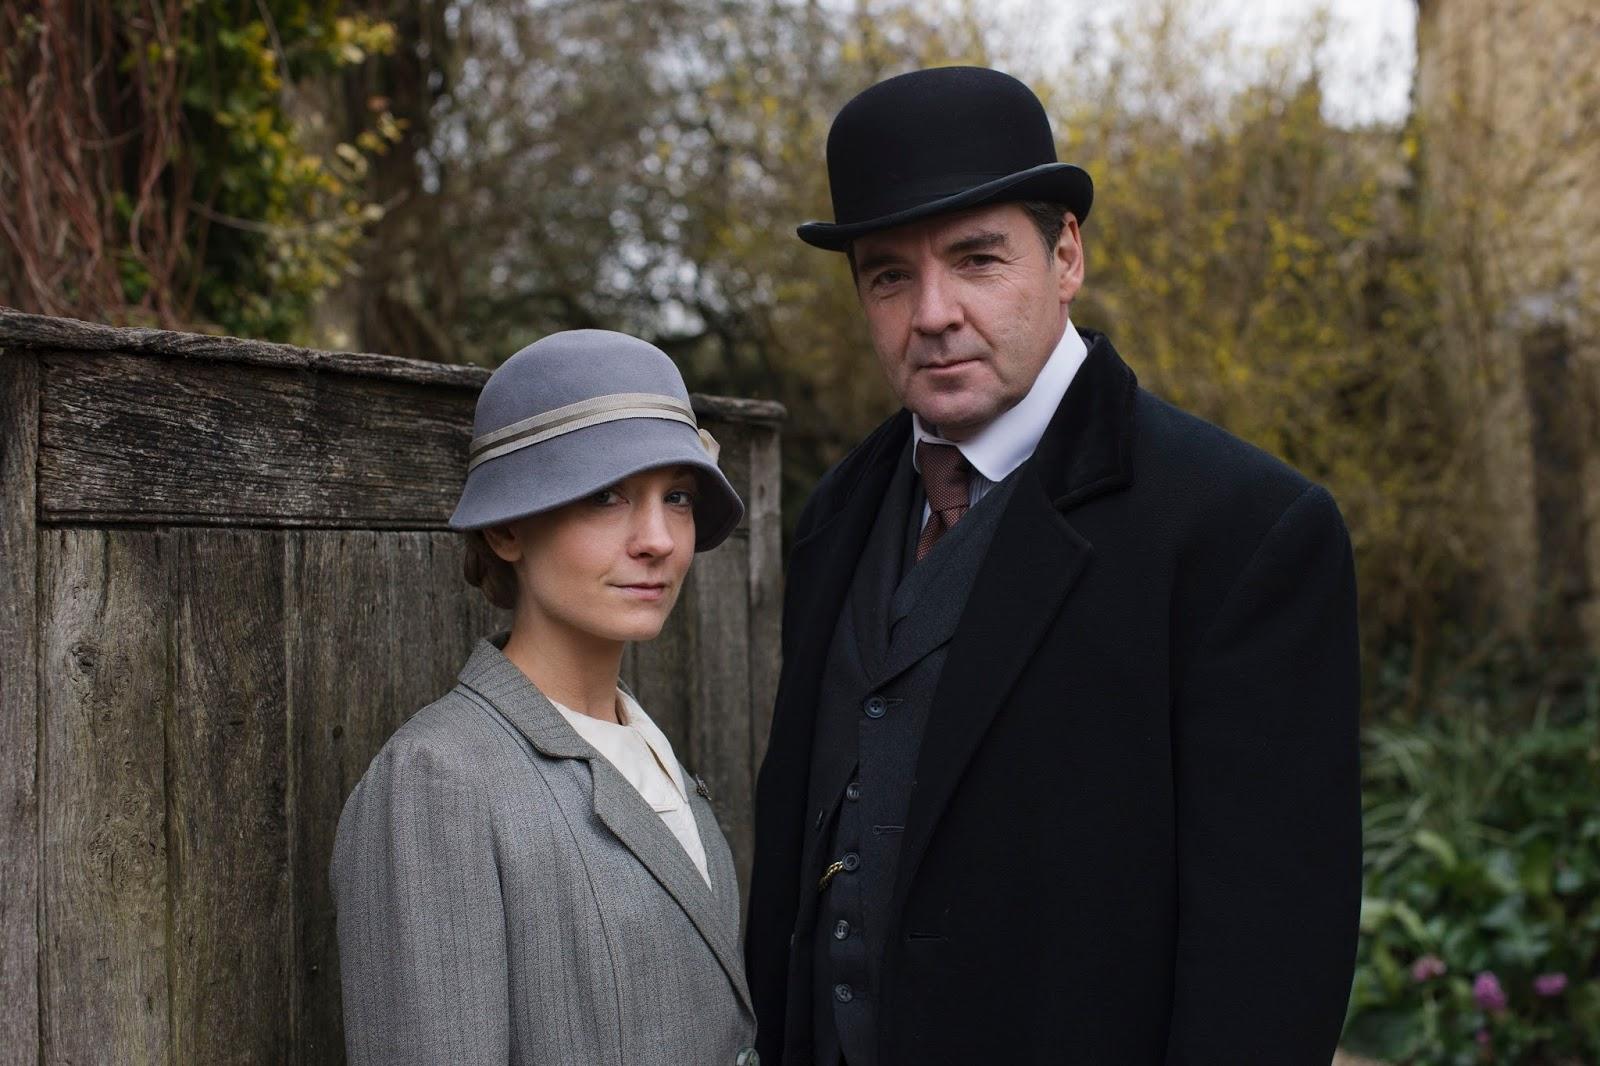 The Jane Austen Film Club: Downton Abbey Season 6 Episode 2